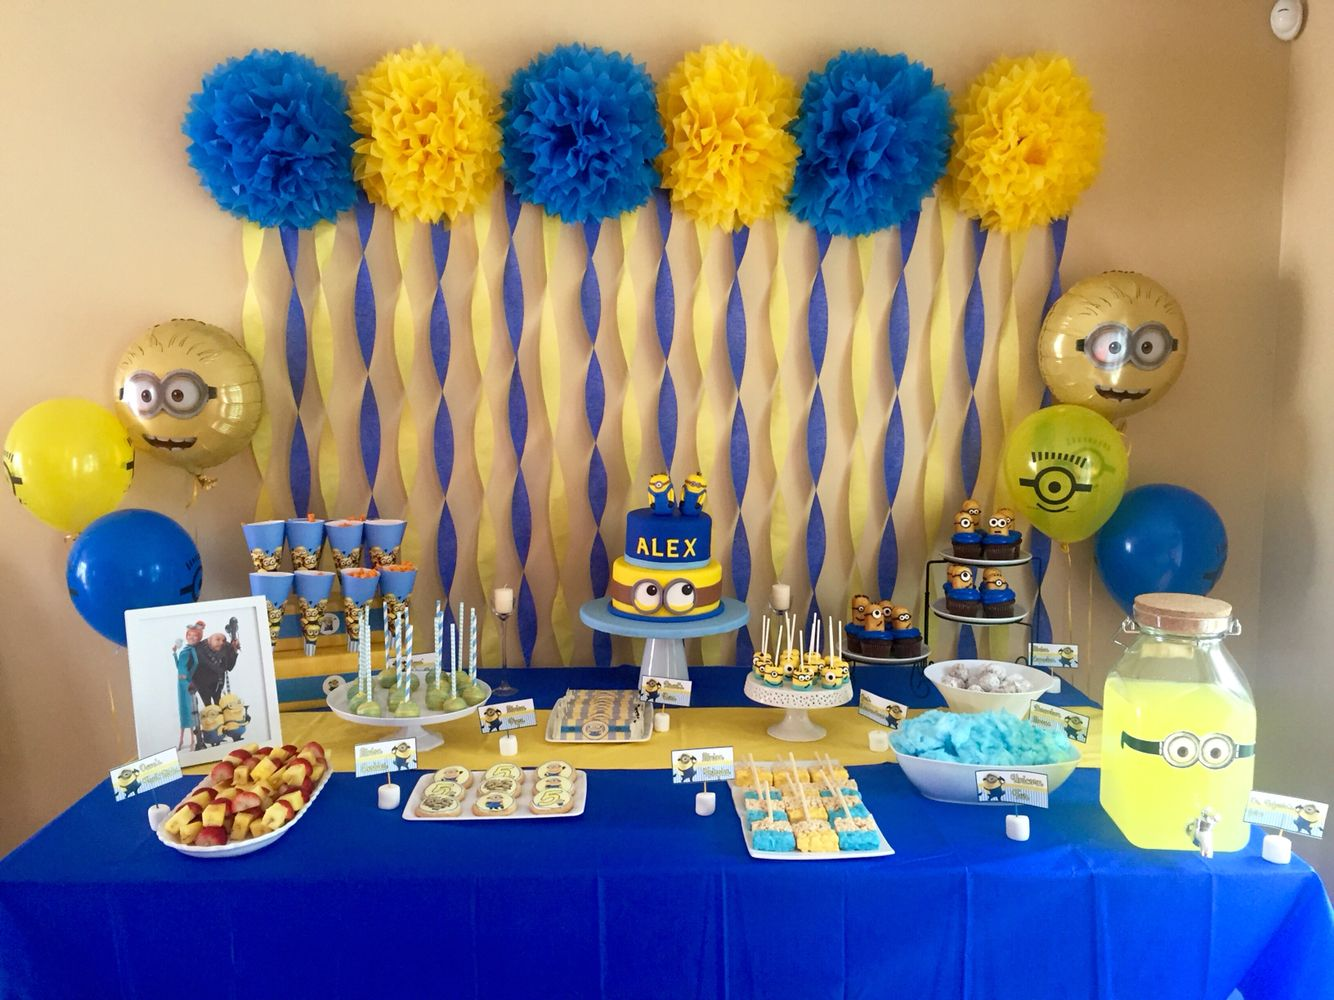 Alex S 5th Minion Birthday Party My Funnest Setup Yet Tags Minion Kids Themed Birthday Parties Minion Party Decorations Minions Birthday Party Decorations